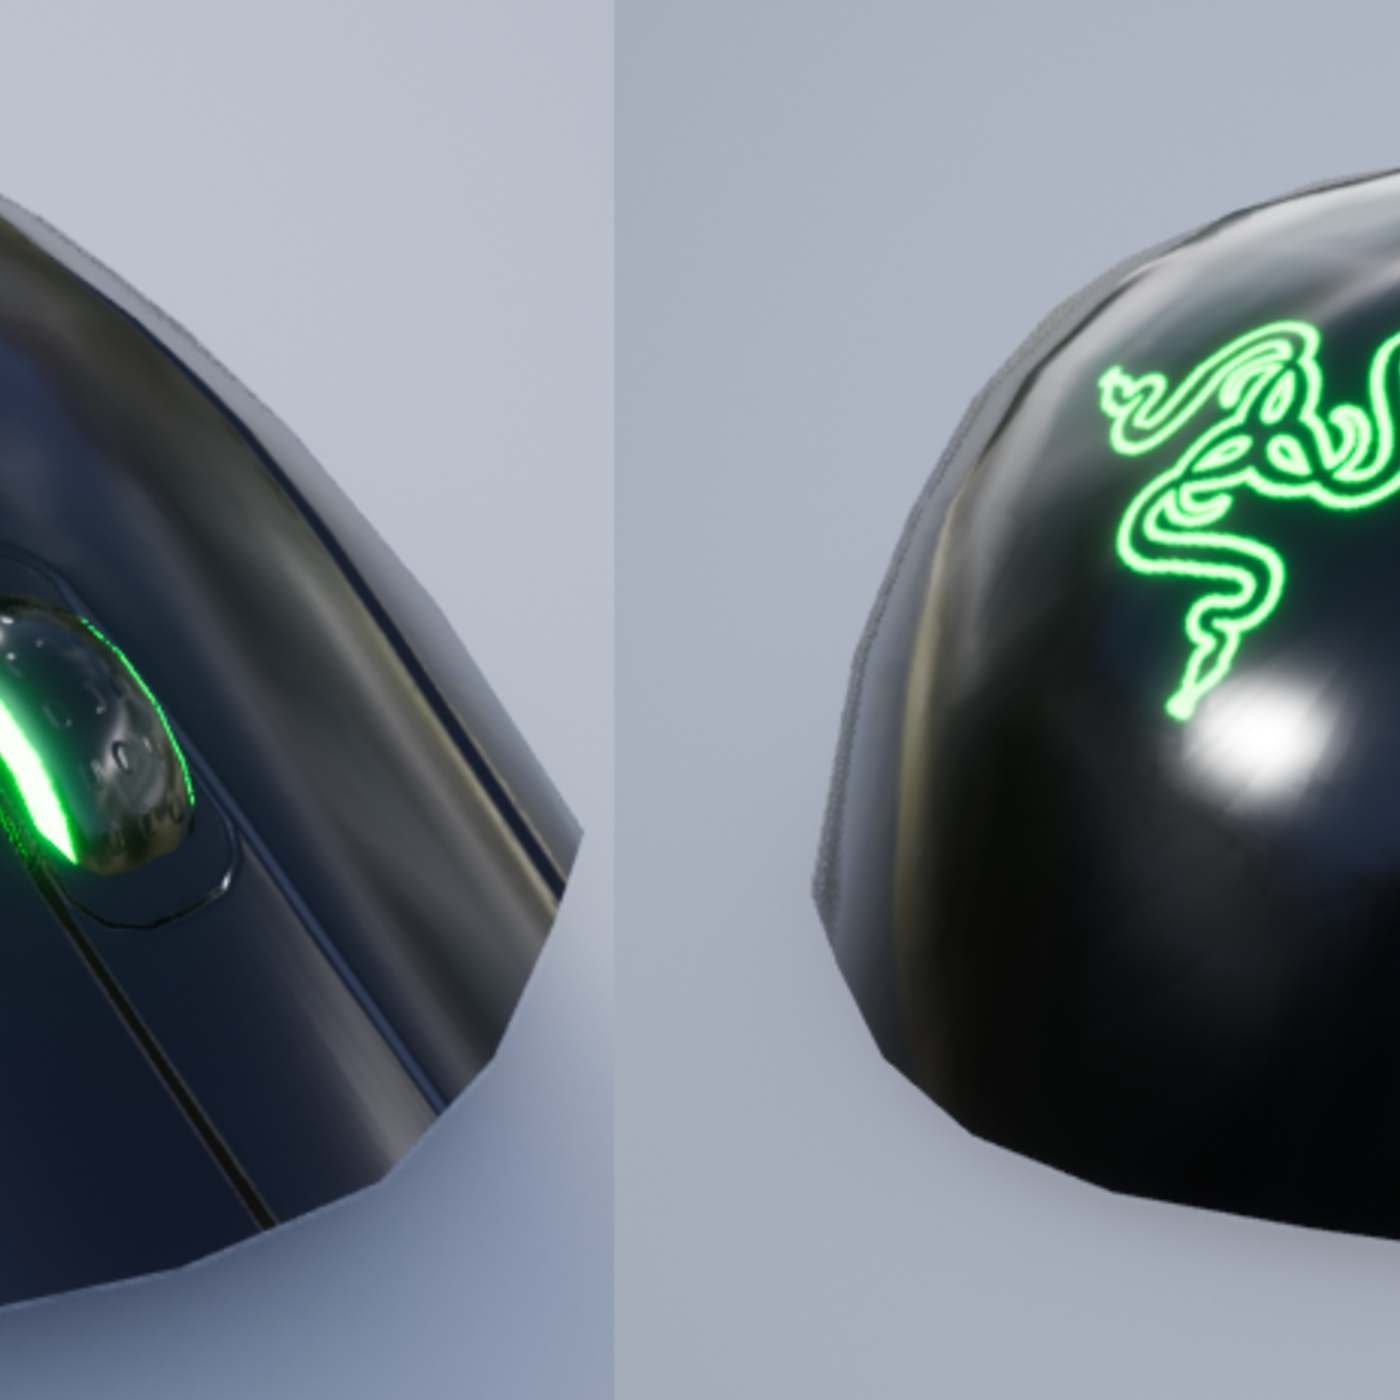 Razer Computer Mouse